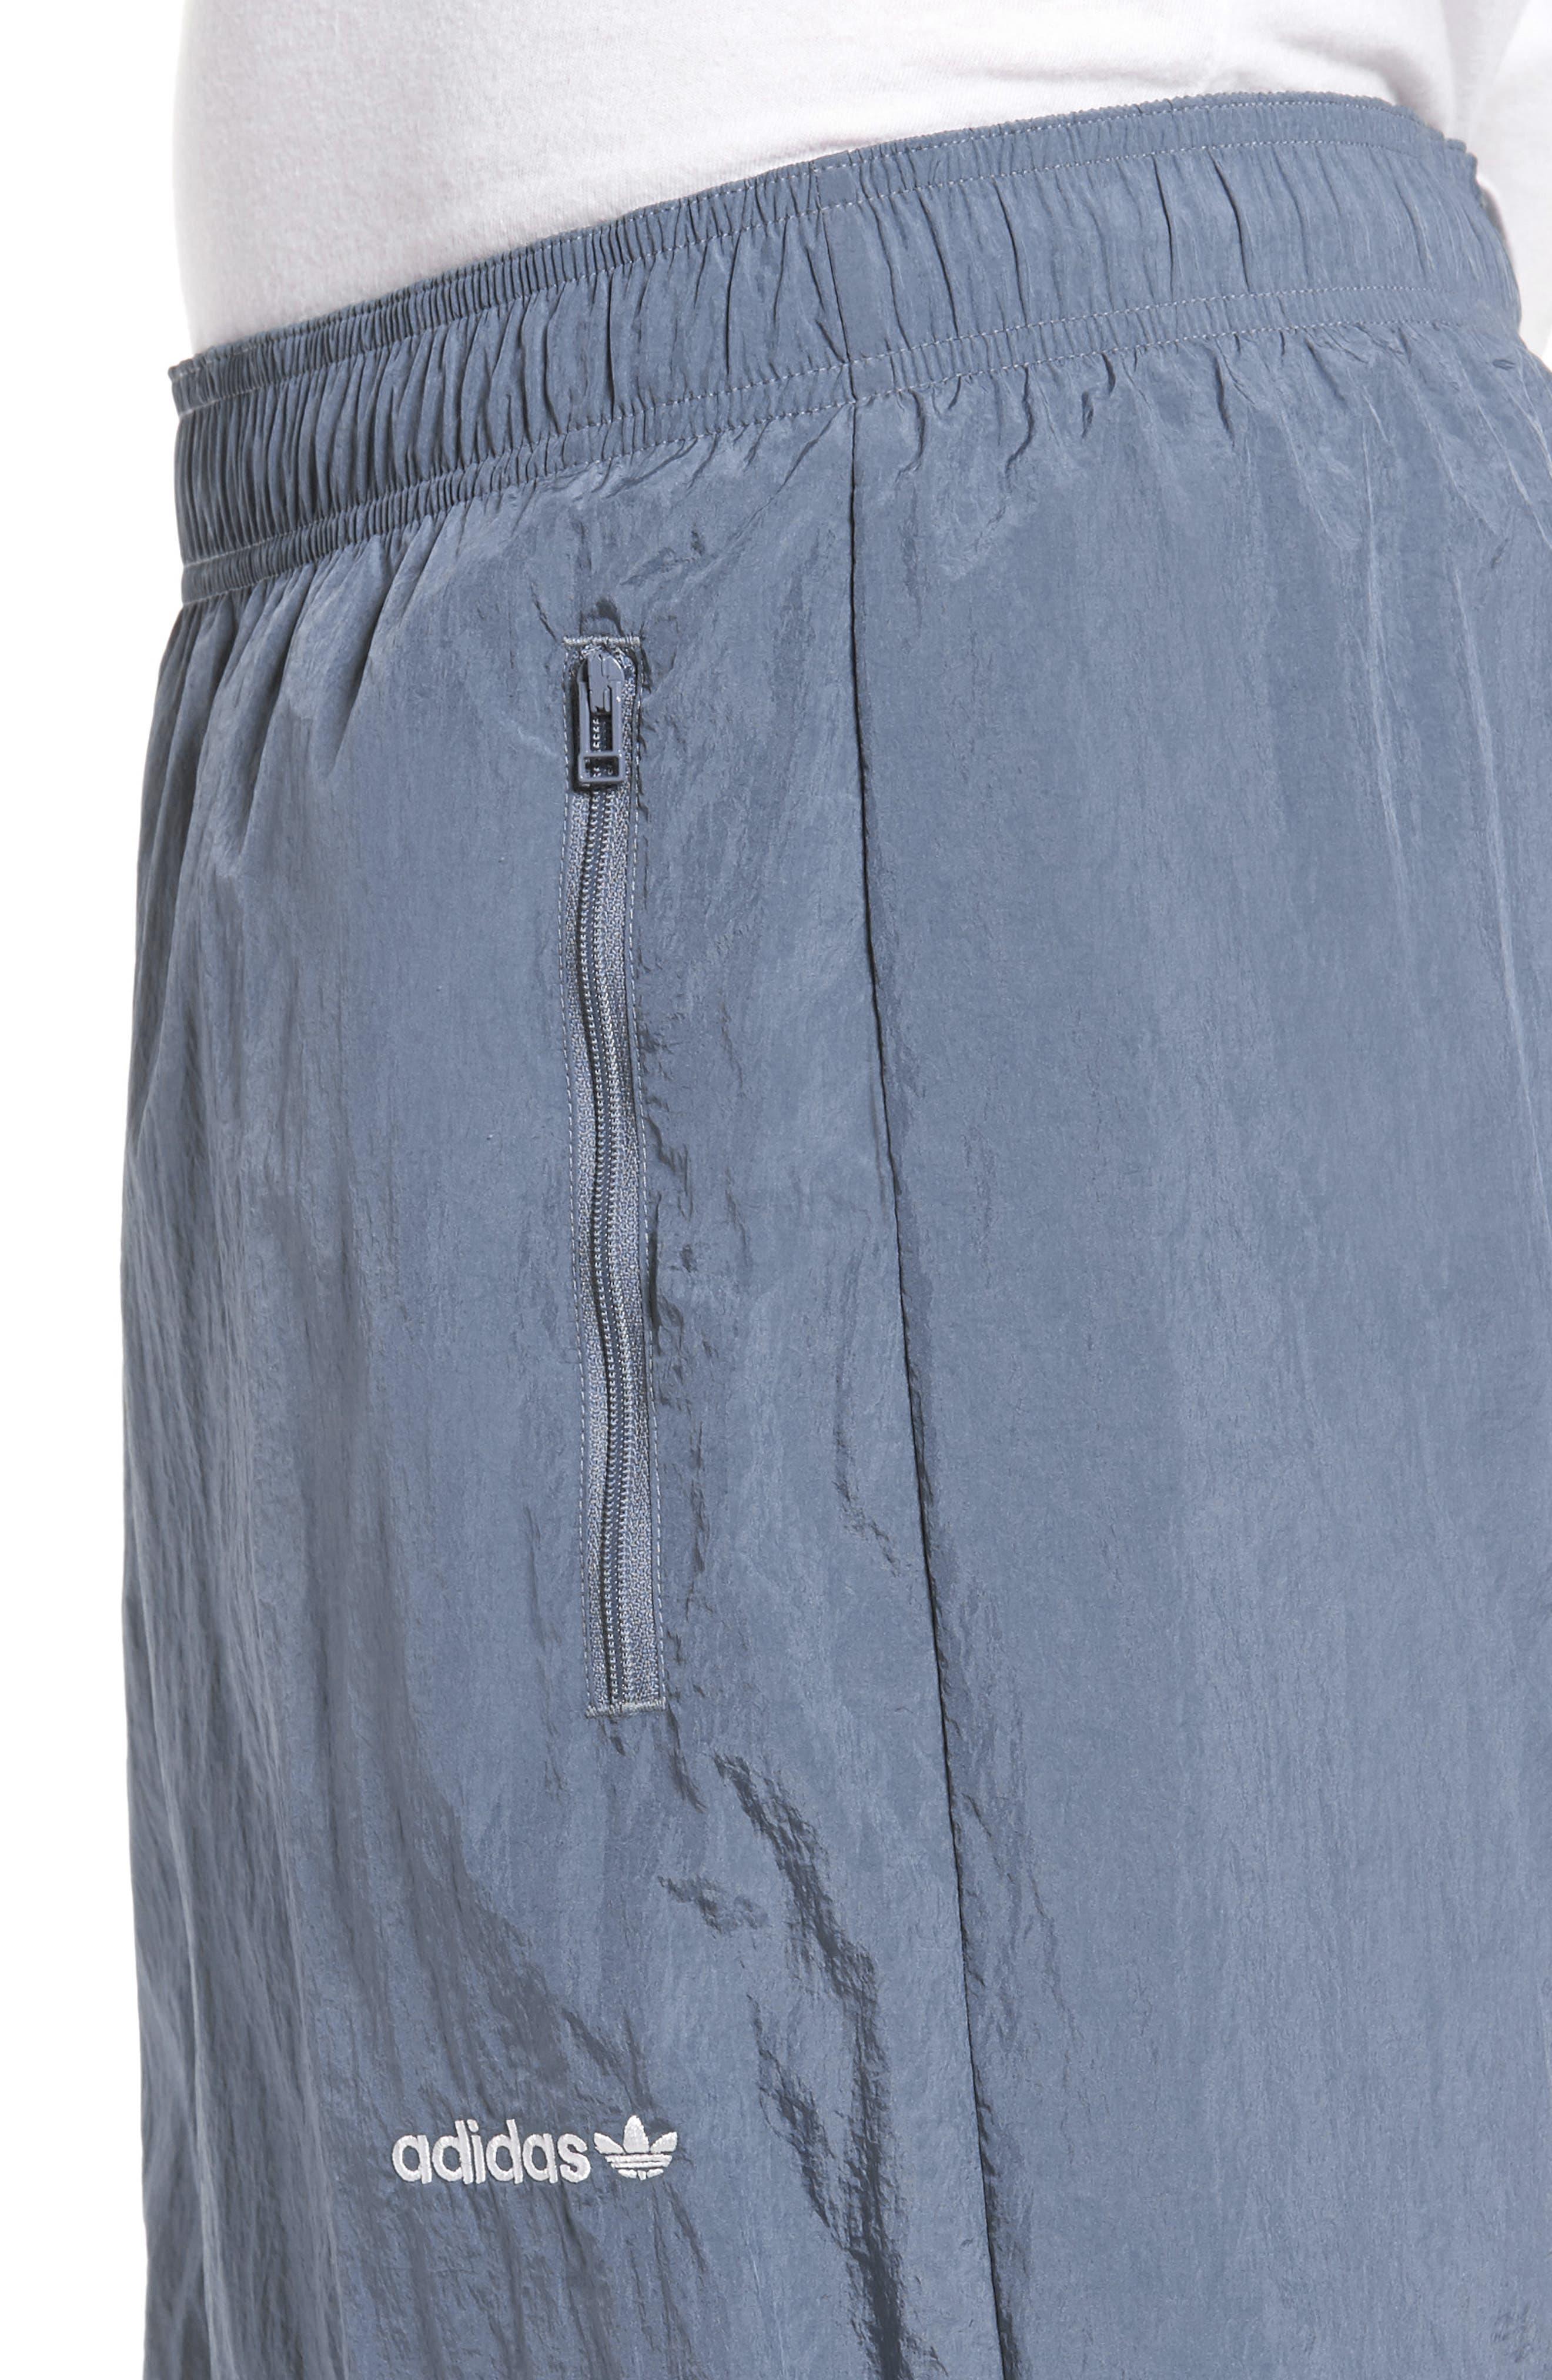 Originals V-Stripe Windpants,                             Alternate thumbnail 4, color,                             422